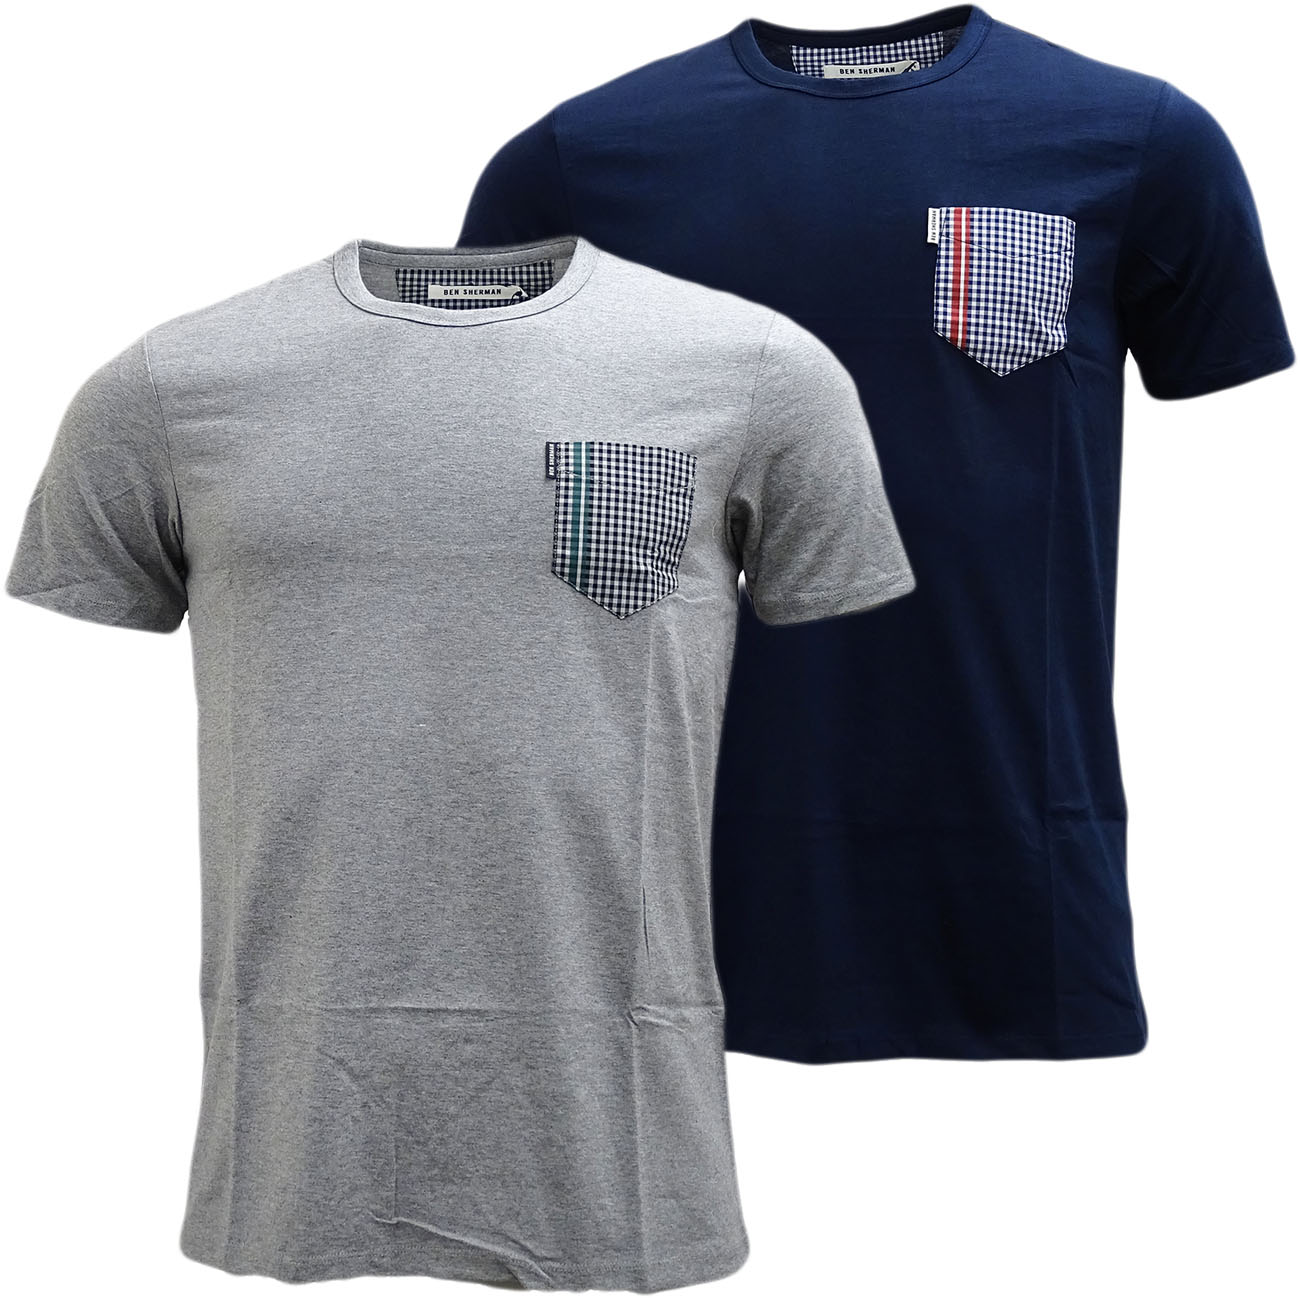 Mens Ben Sherman T Shirt Top Gingham Pocket